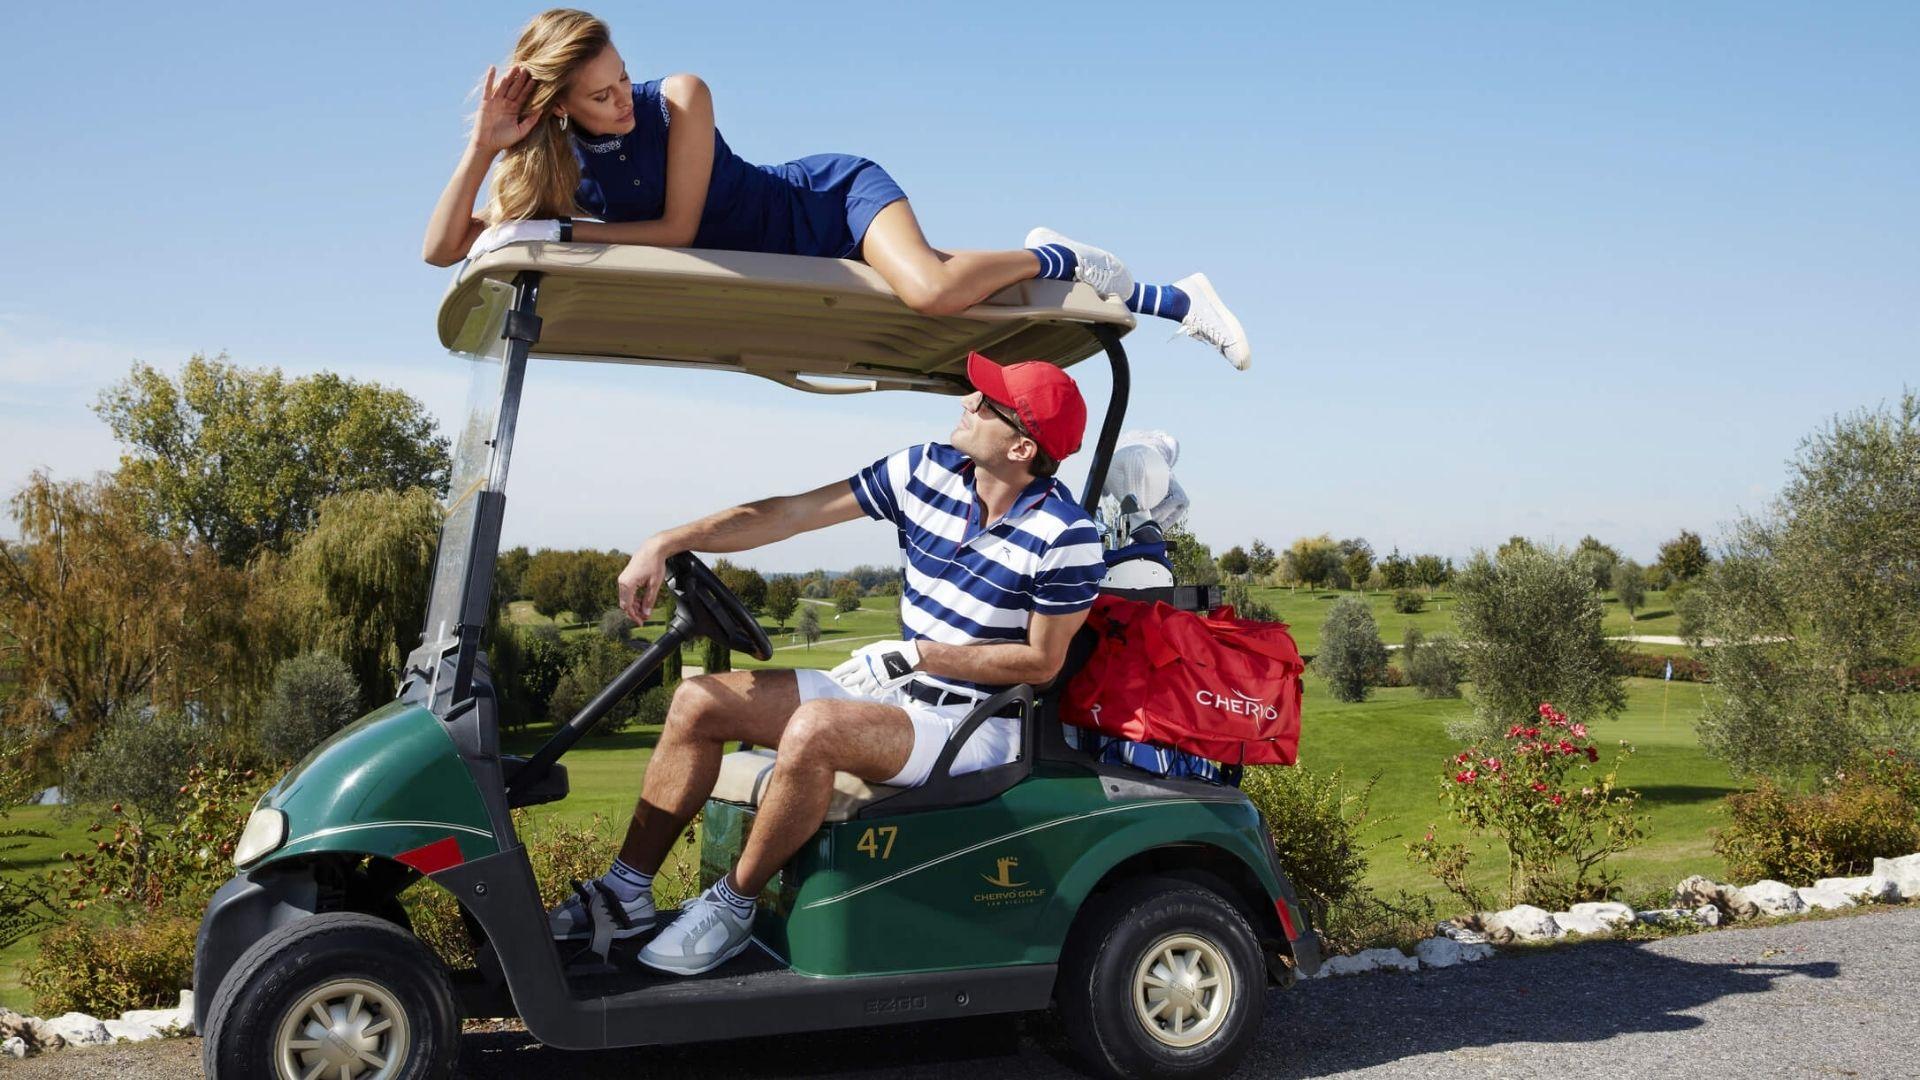 Chervo Golf Clothing Company